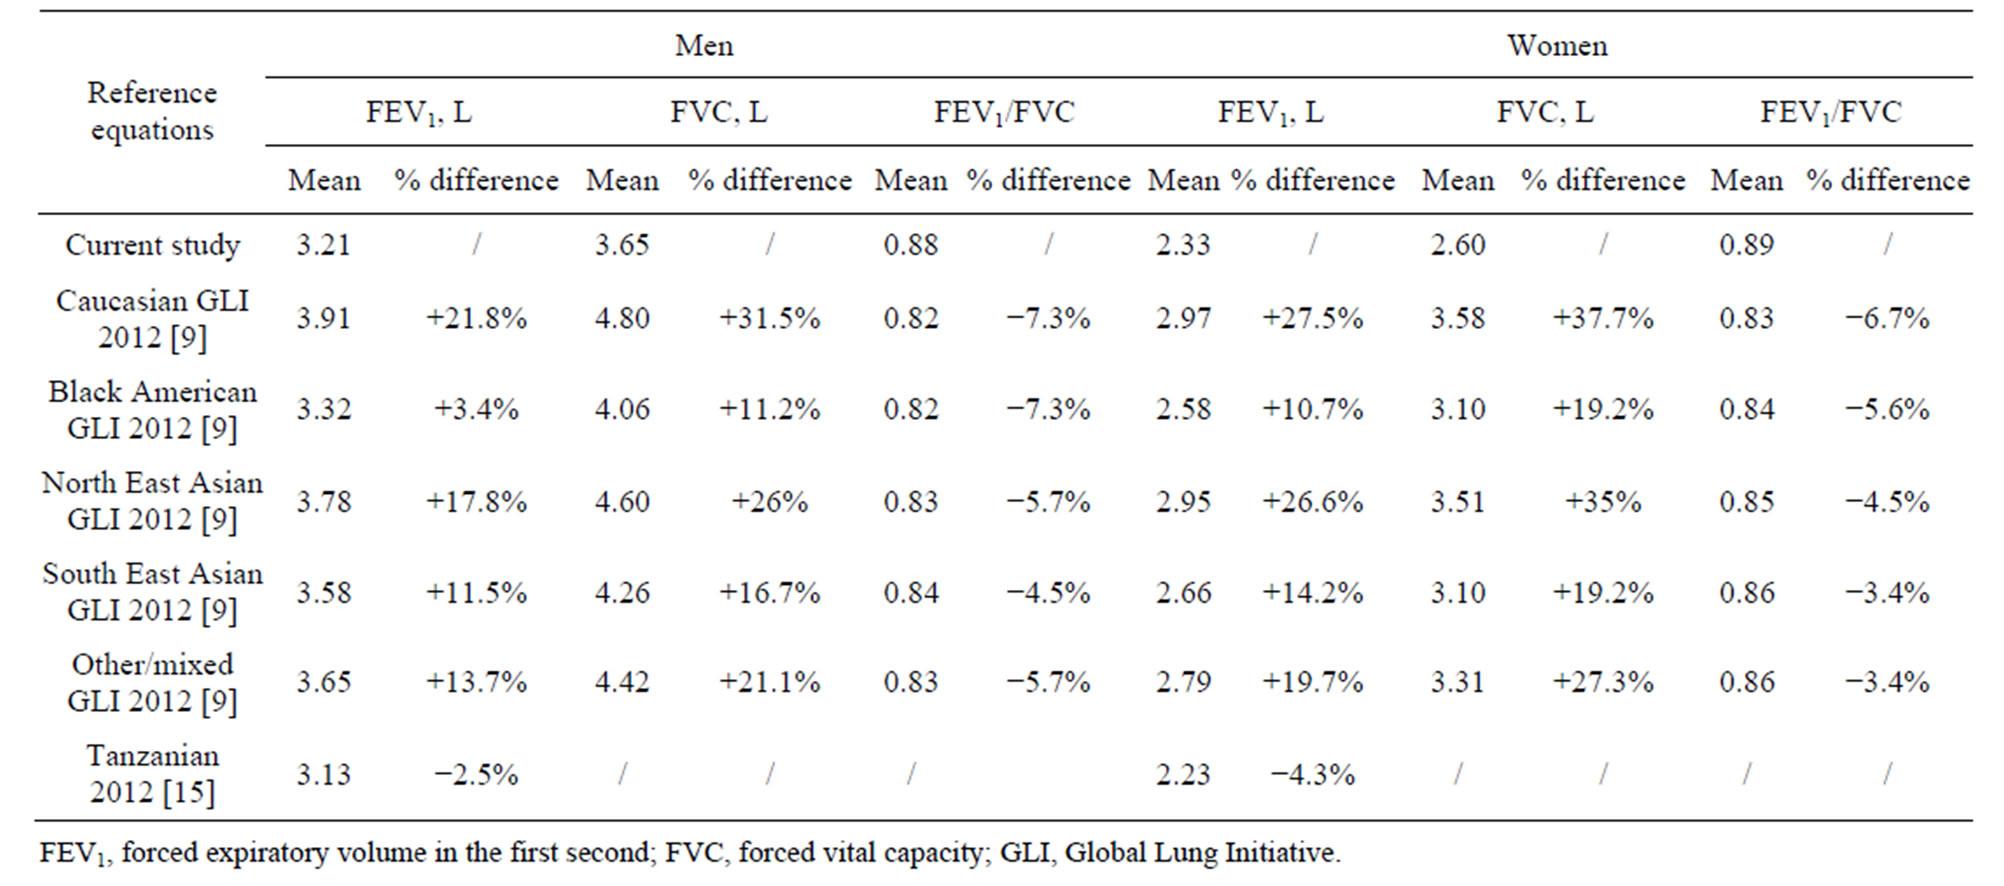 relationship study vs prediction